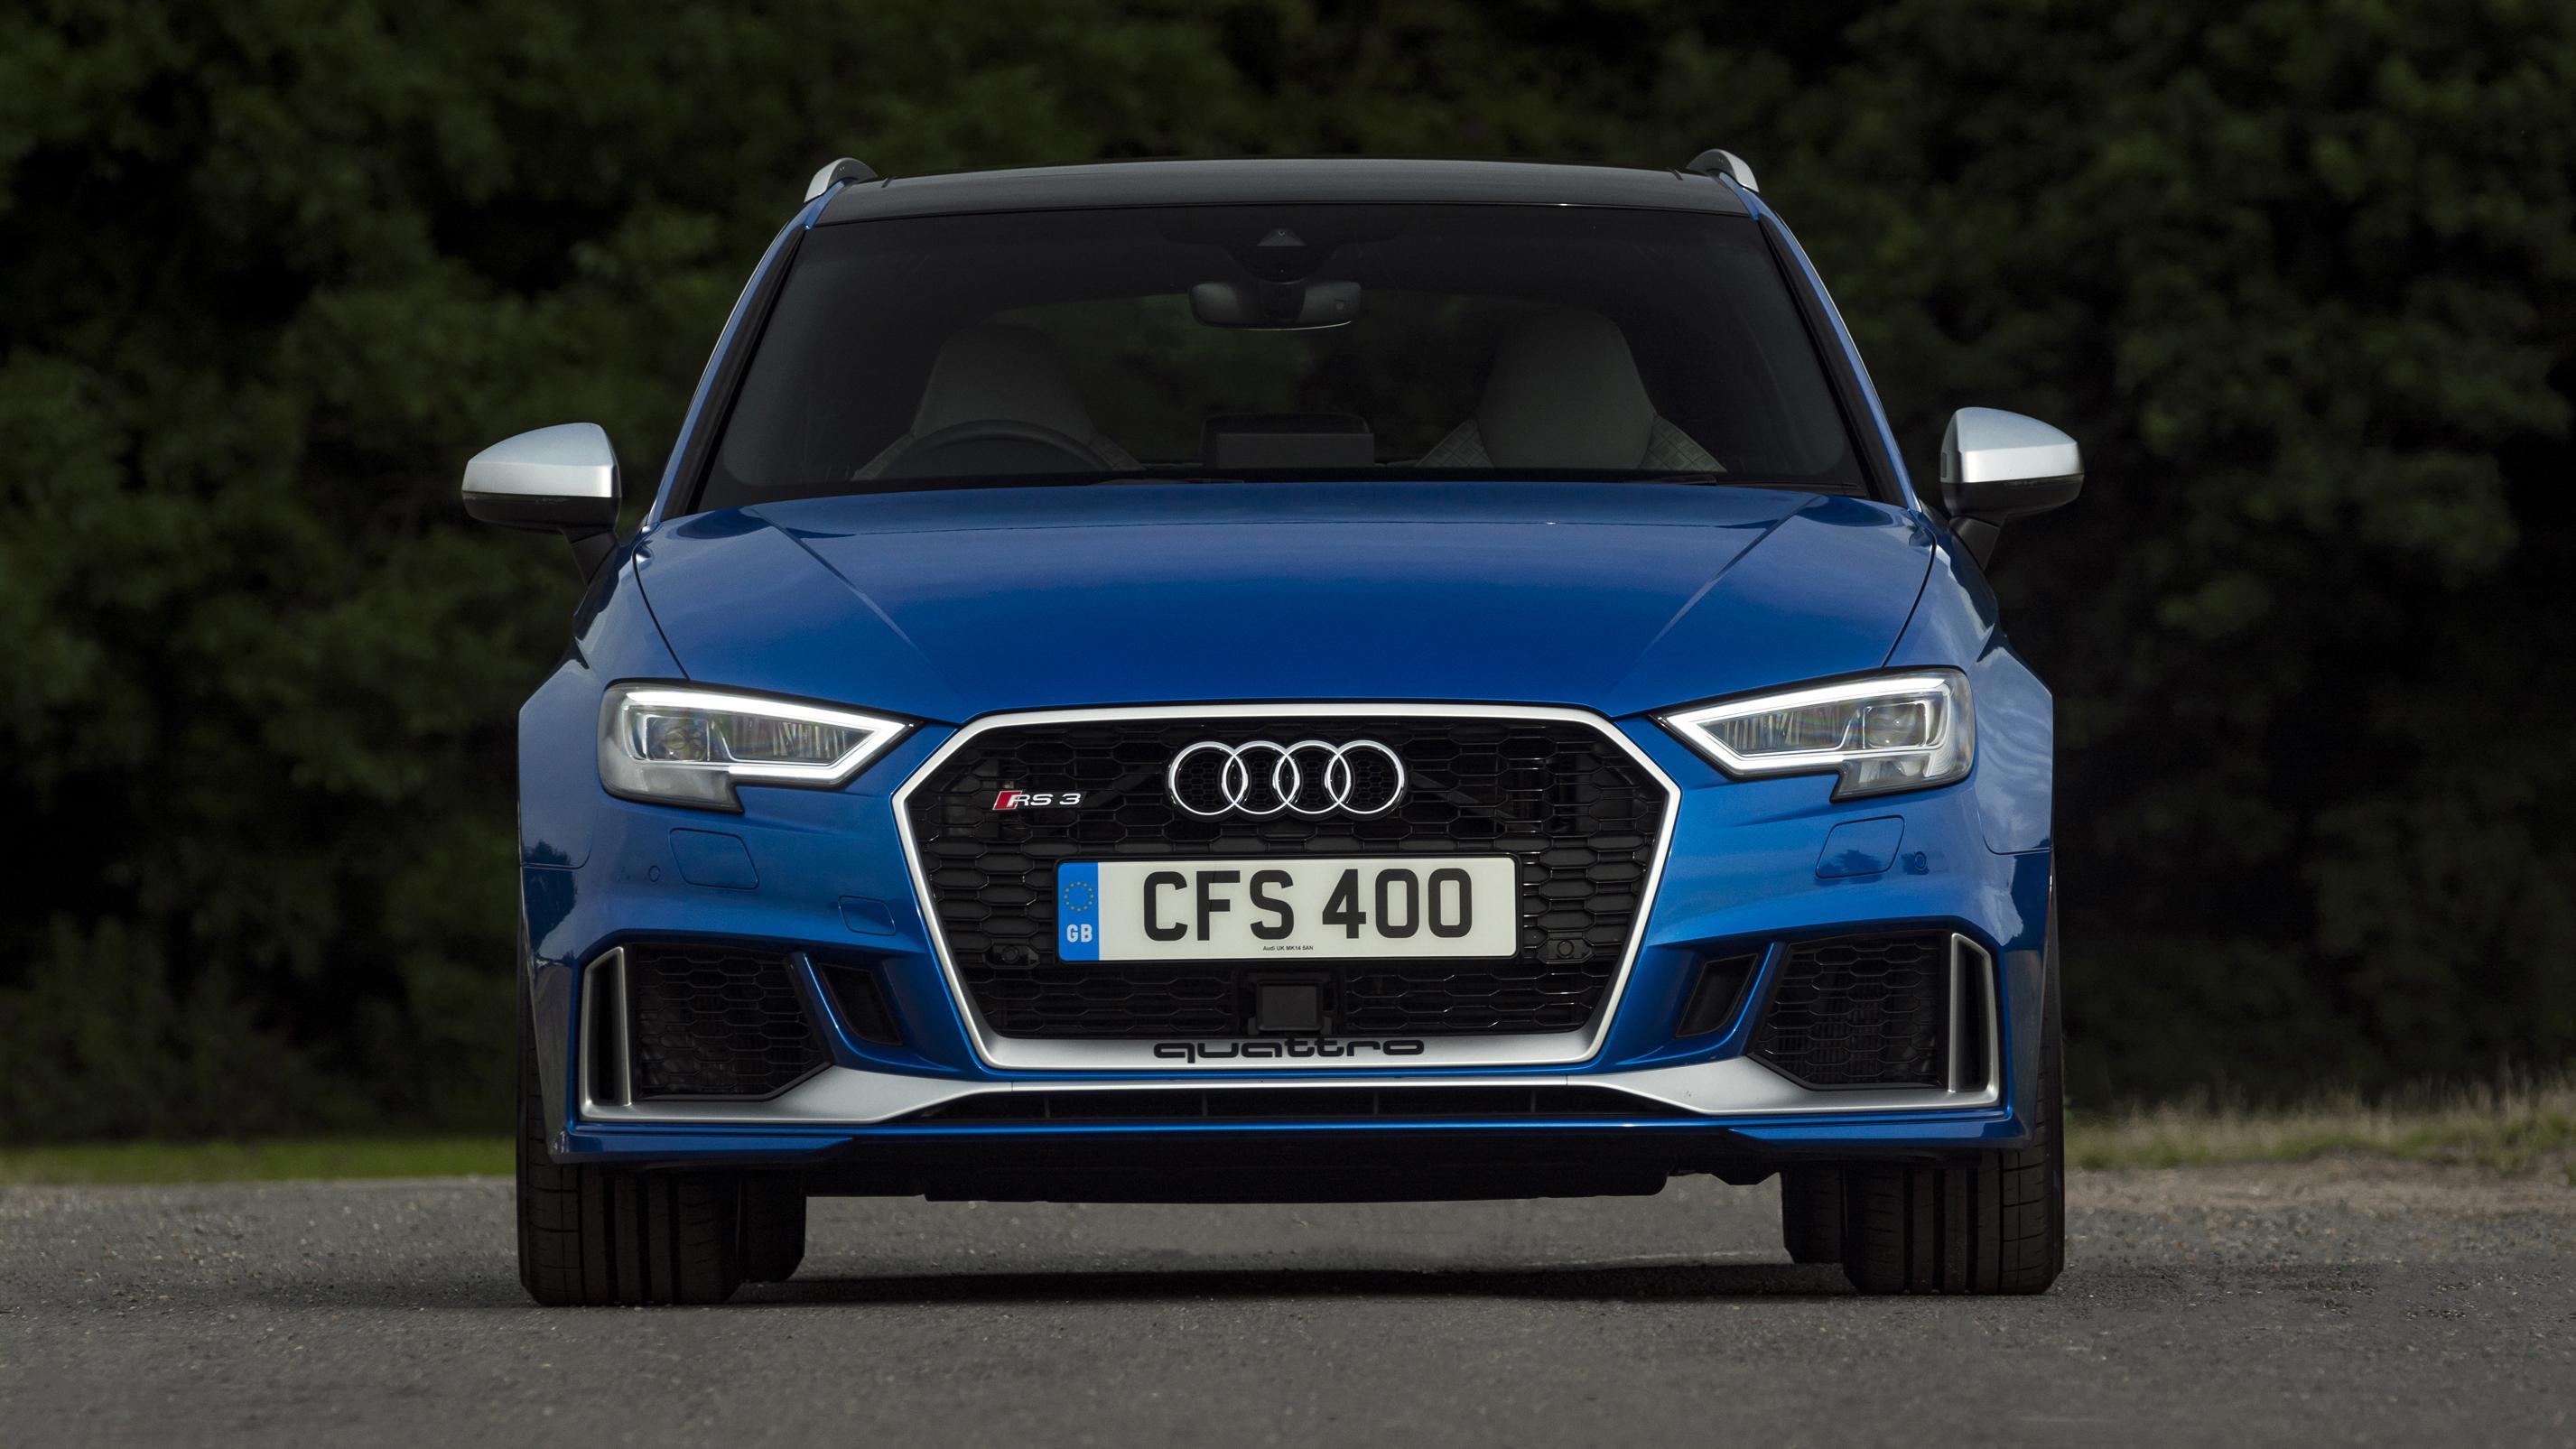 Audi RS3 Sportback front